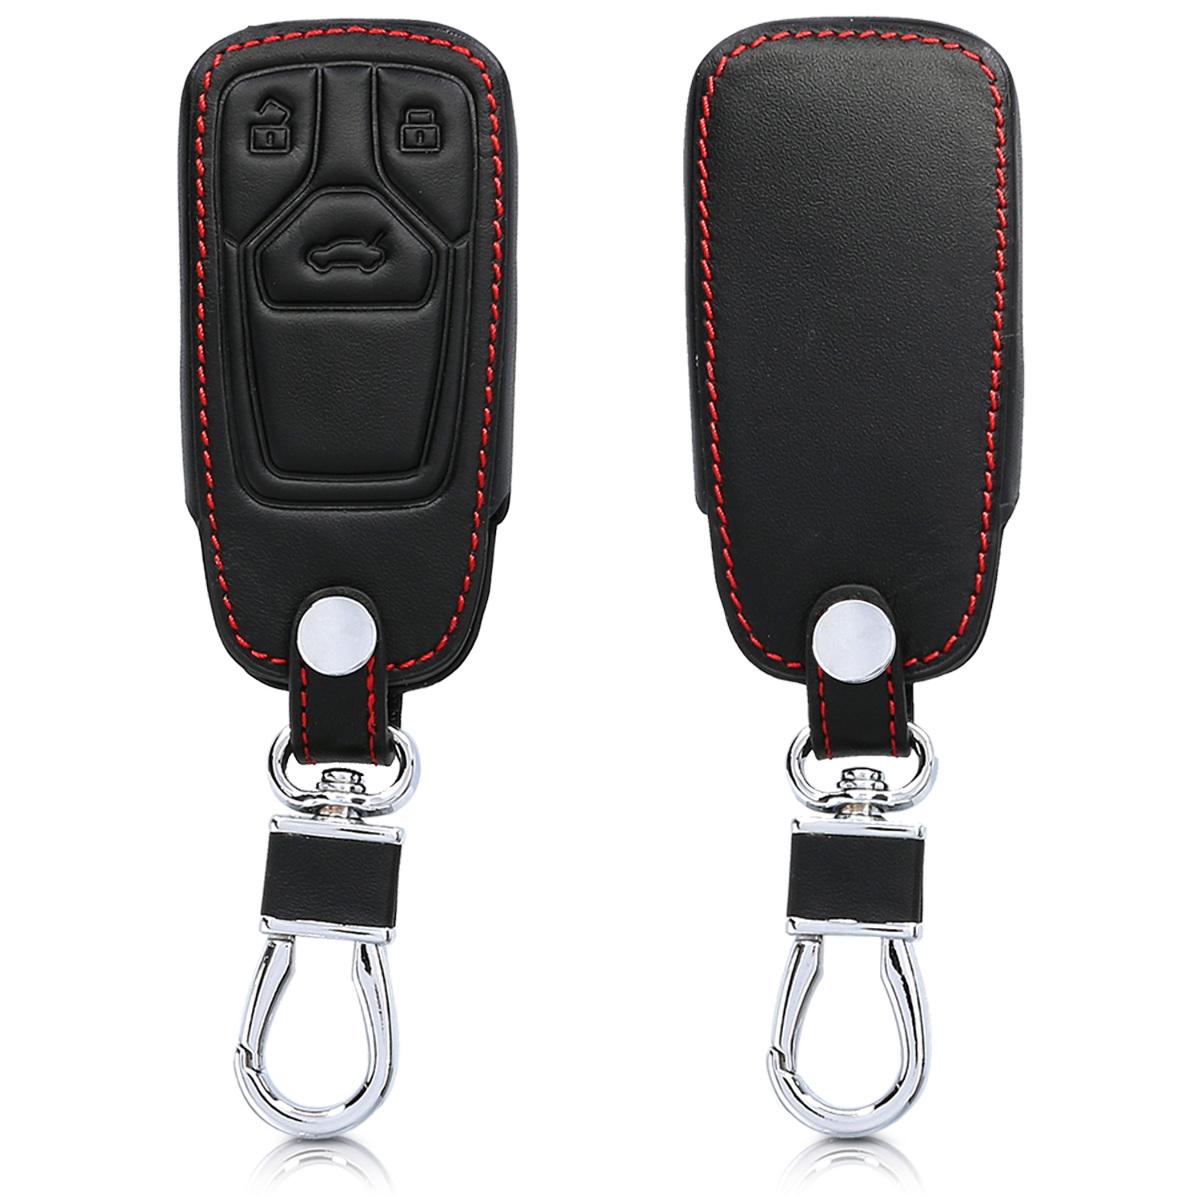 KW Θήκη Κλειδιού Audi - Συνθετικό δέρμα - 3 Κουμπιά - Black (44711.01)